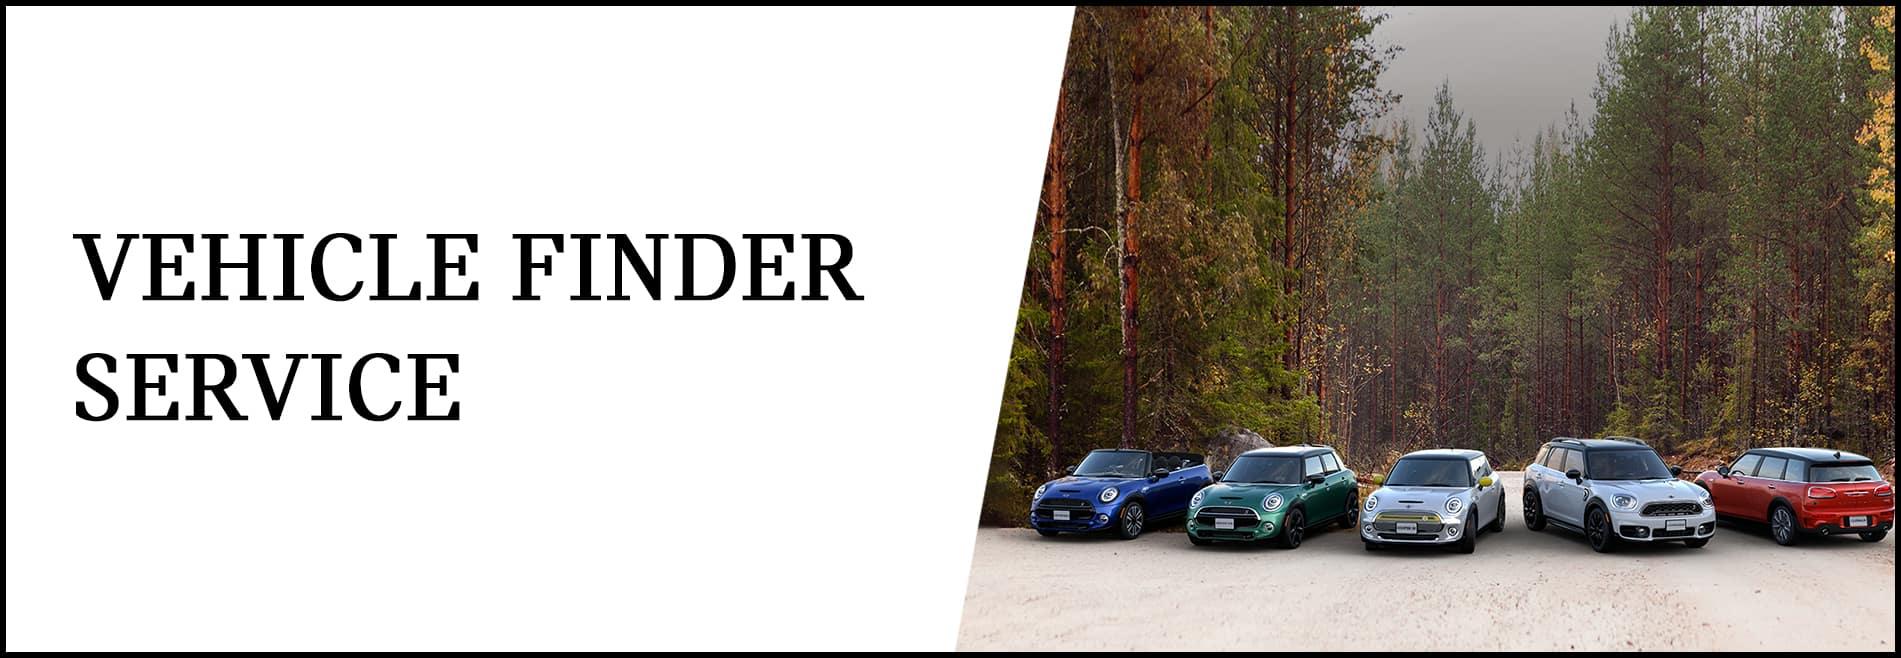 Vehicle Finder Service at Patrick MINI